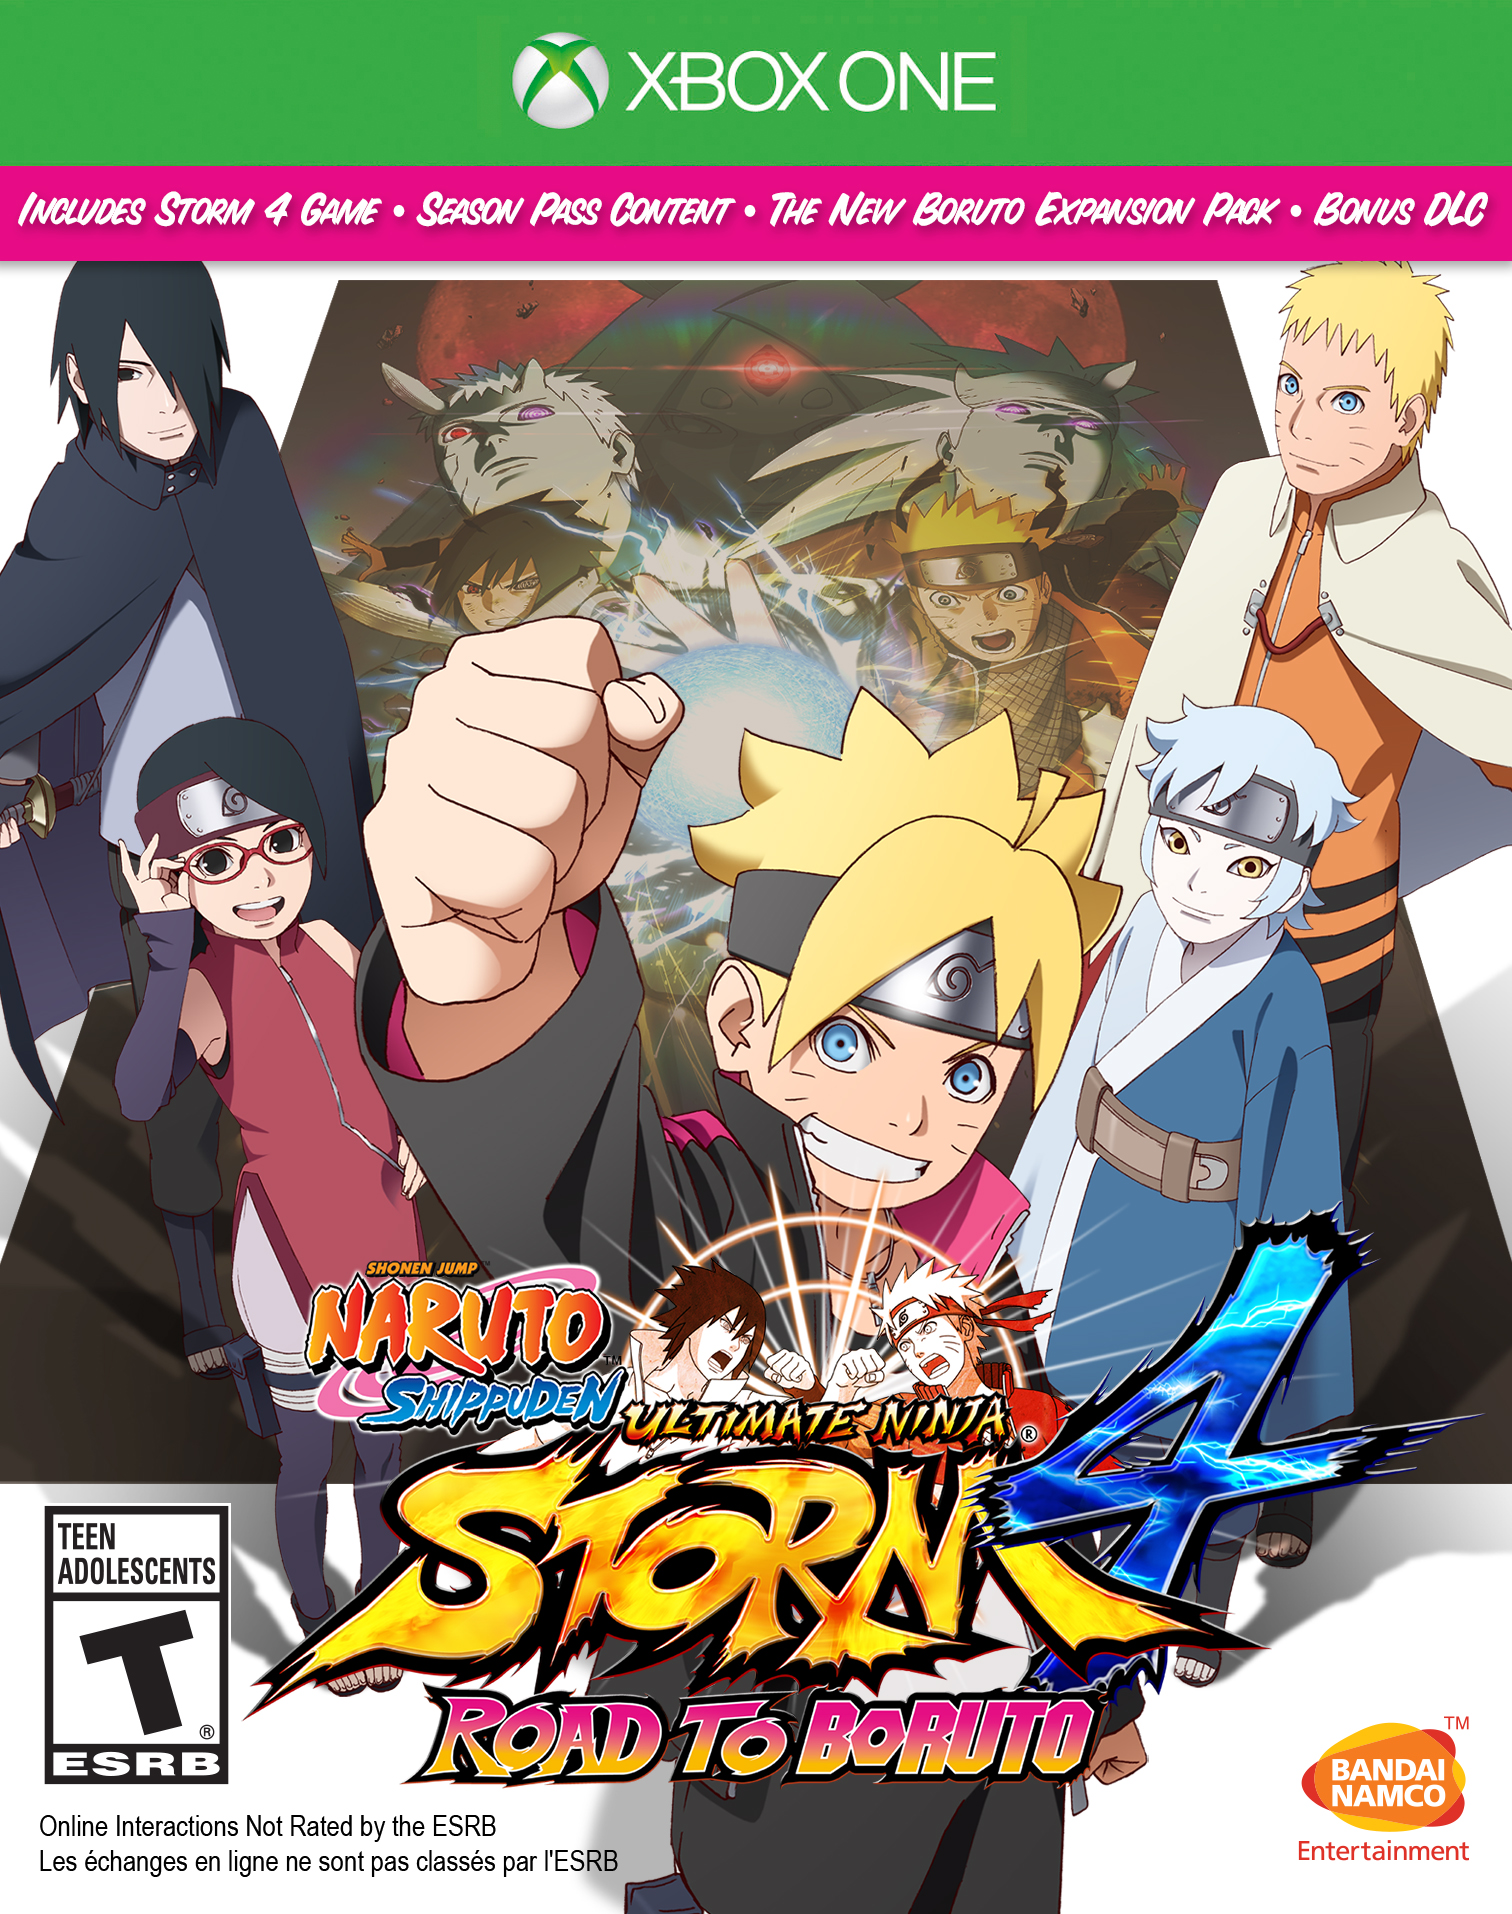 NARUTO SHIPPUDEN: Ultimate Ninja STORM 4 Road to BORUTO (Xbox One) | Bandai  Namco Store